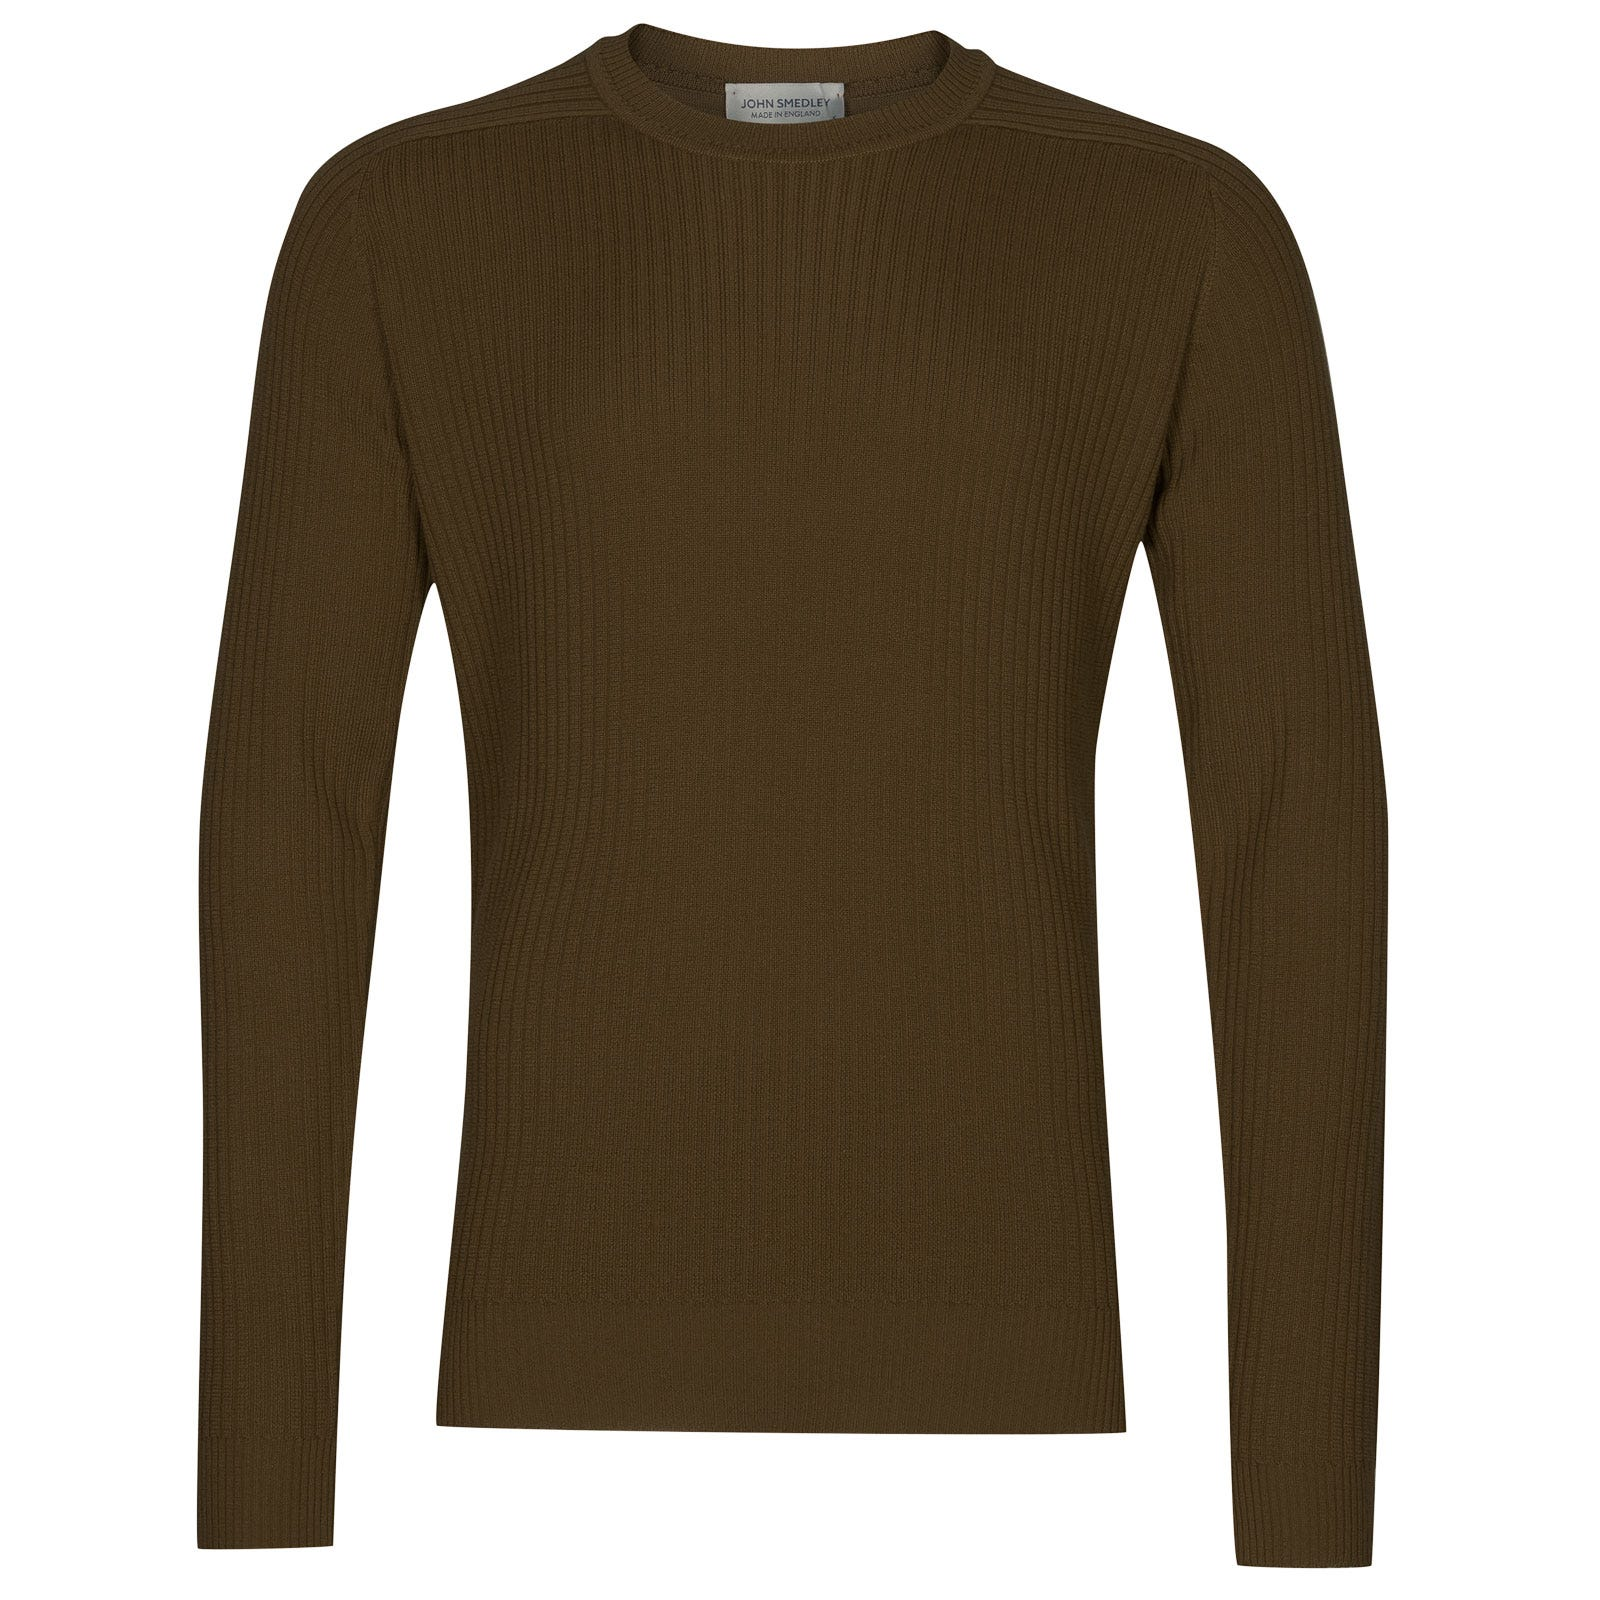 John Smedley idris Merino Wool Pullover in Kielder Green-M